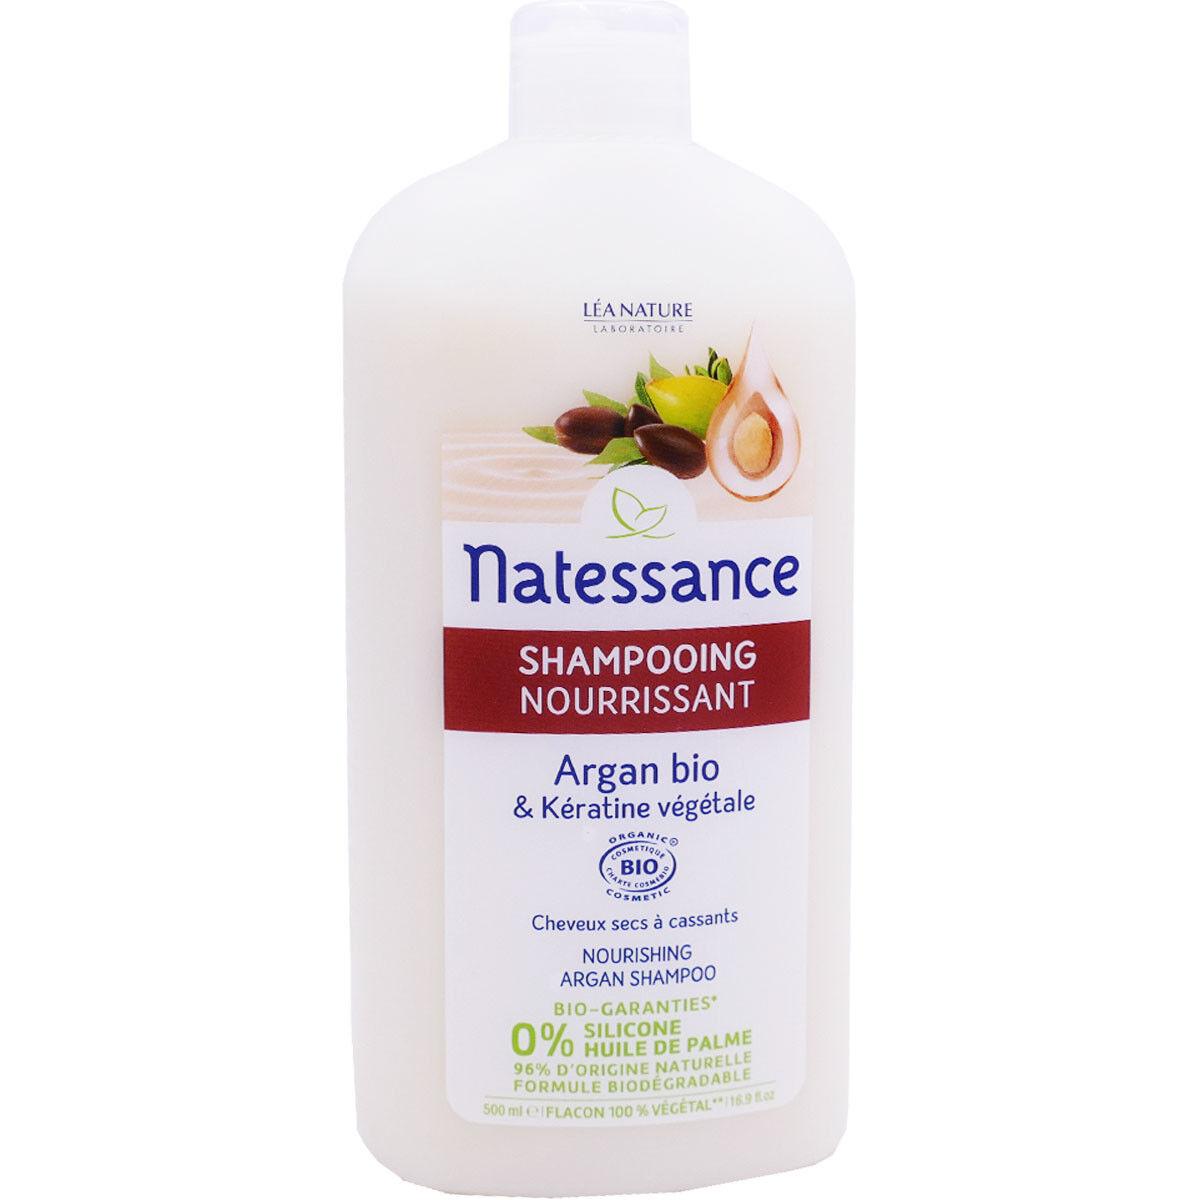 Natessance shampooing argan bio 500 ml